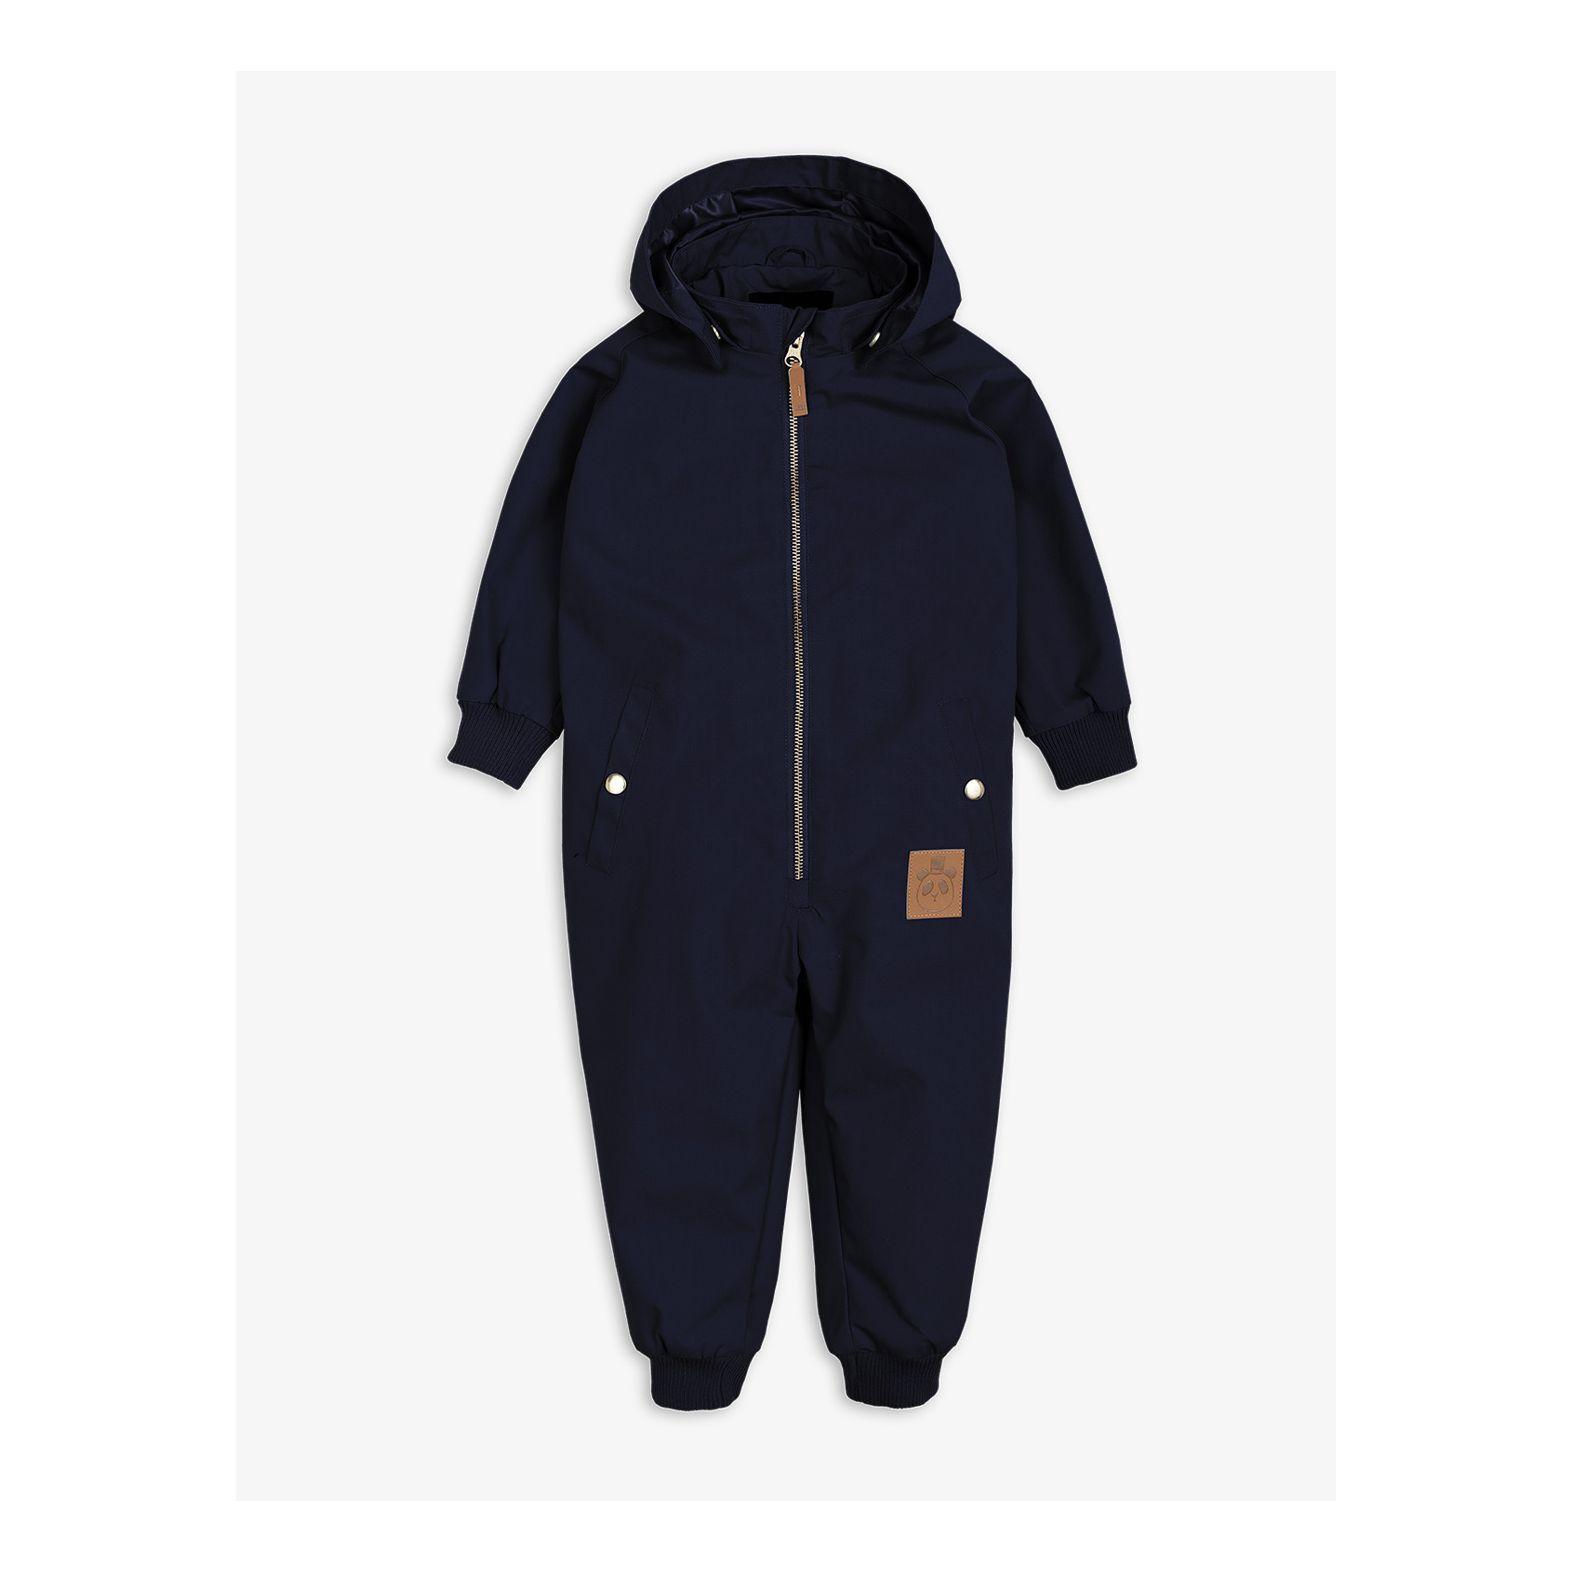 billig overall baby